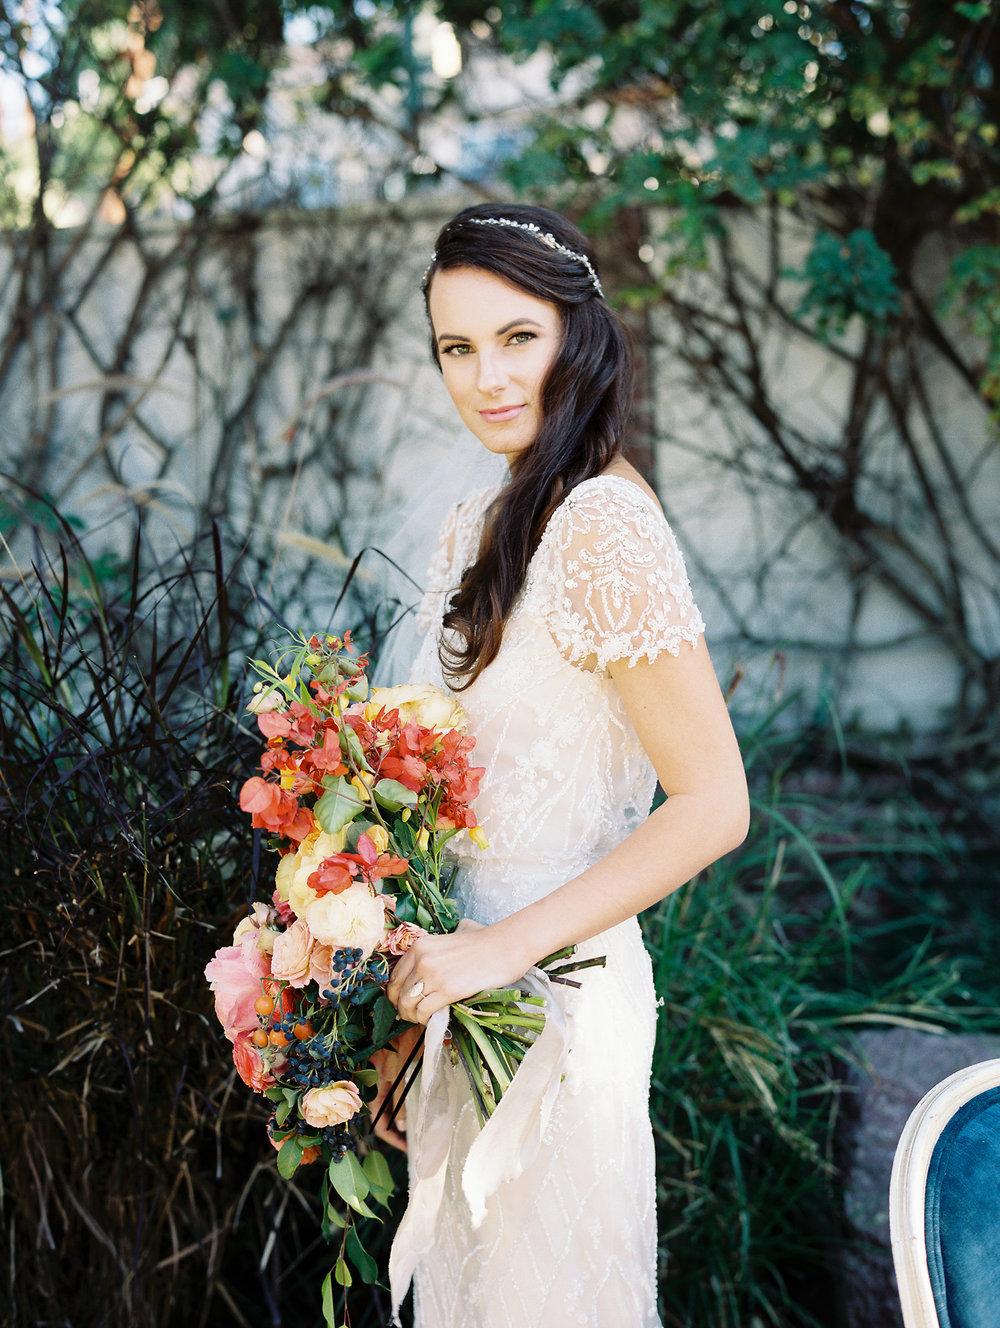 Traditional Wedding With A Modern Twist In Greece Bride Portrait